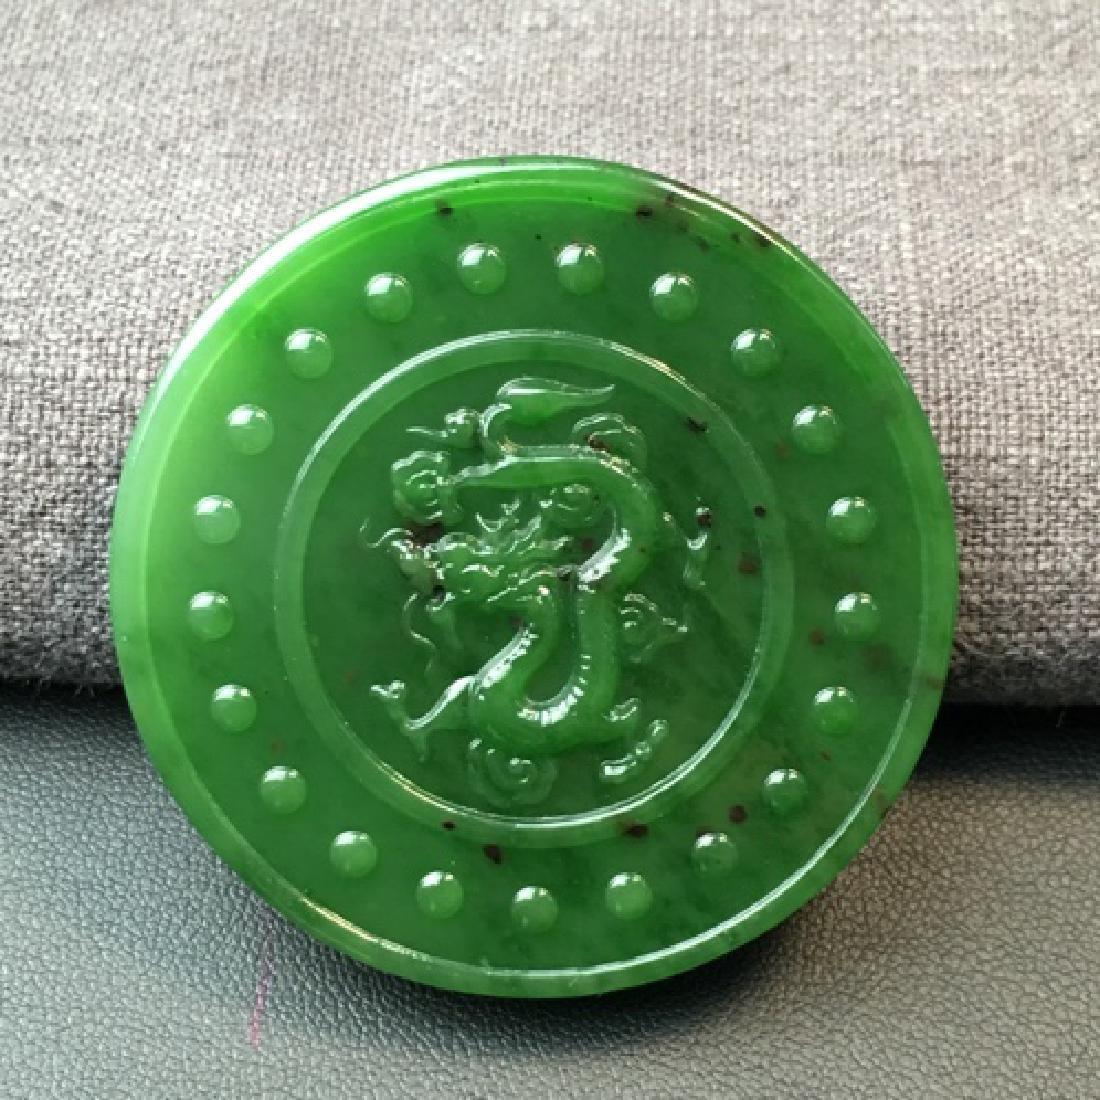 DRAGON SHAPED HETIAN GREEN JADE